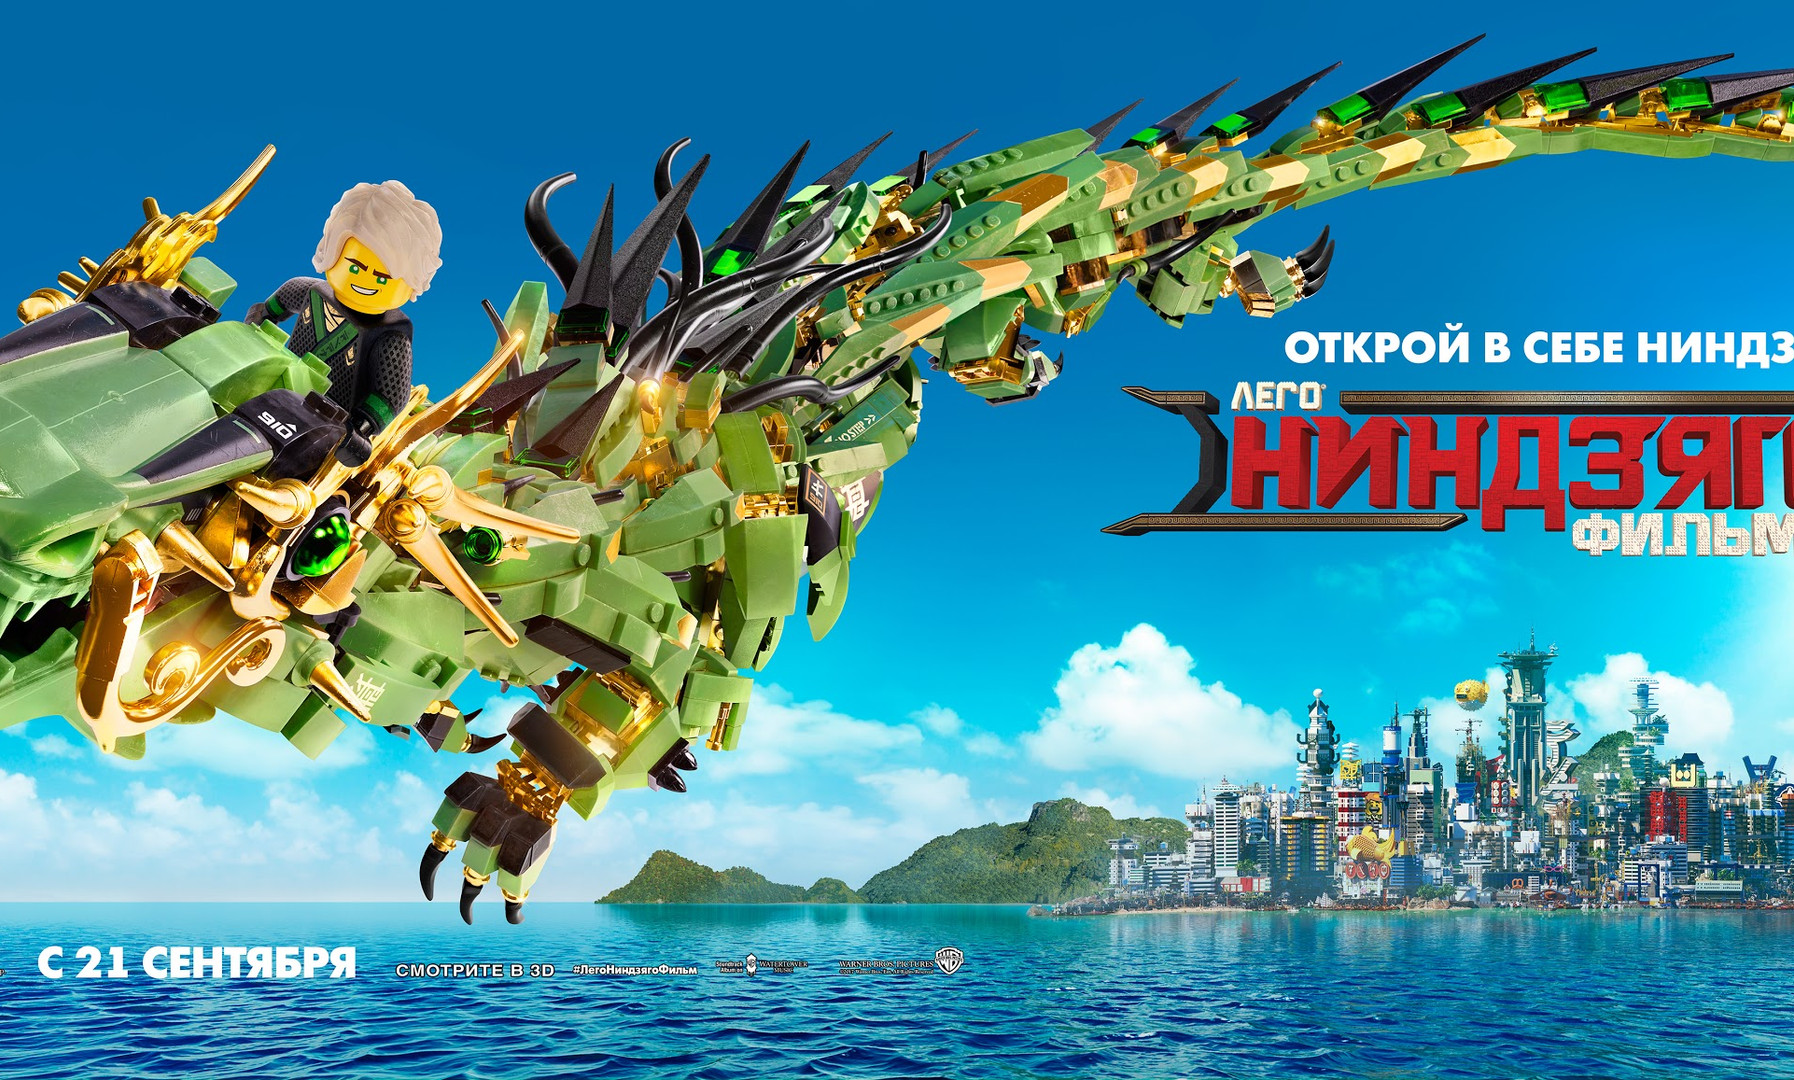 The_Lego_Ninjago_Movie_Banner_JPosters.j